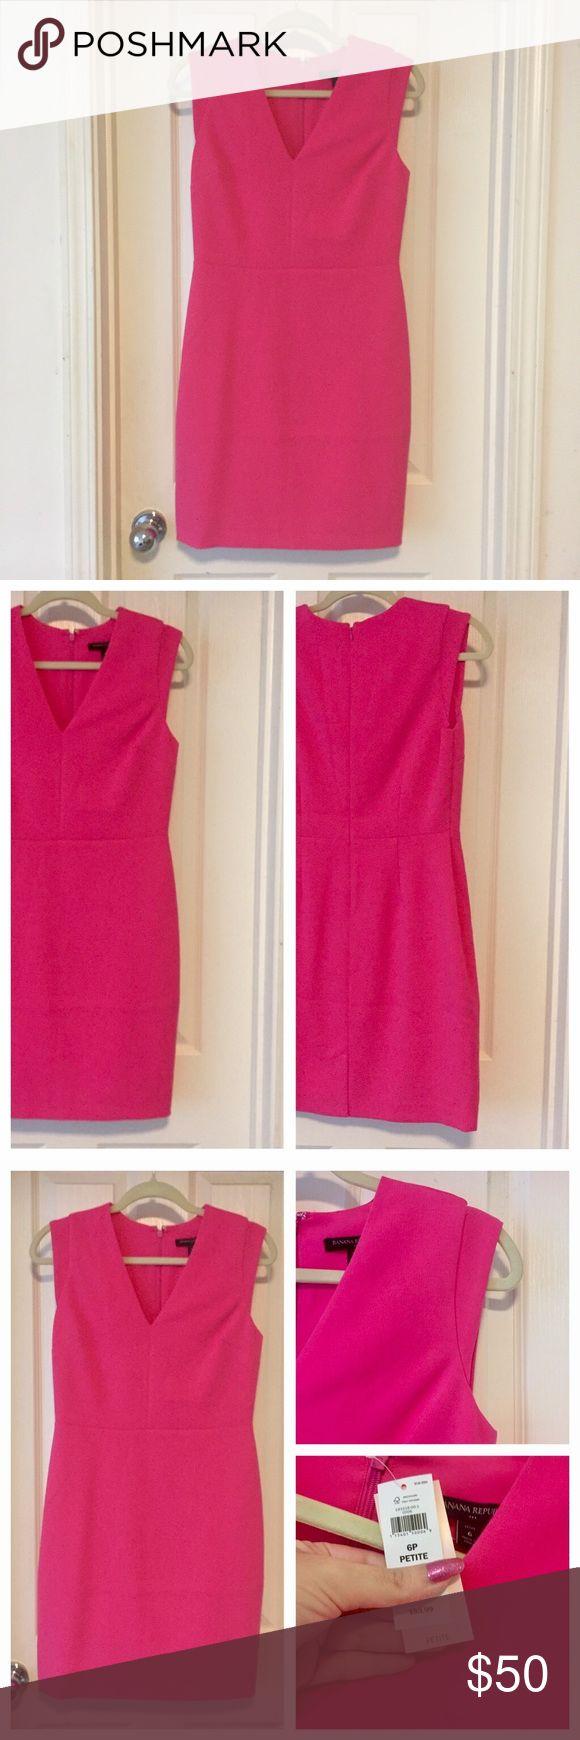 Banana Republic Pink Dress, Size 6 Petite! ⭐️Markdown⭐️ anana Republic, Pink Dress, NWT, Size 6P. Banana Republic Dresses